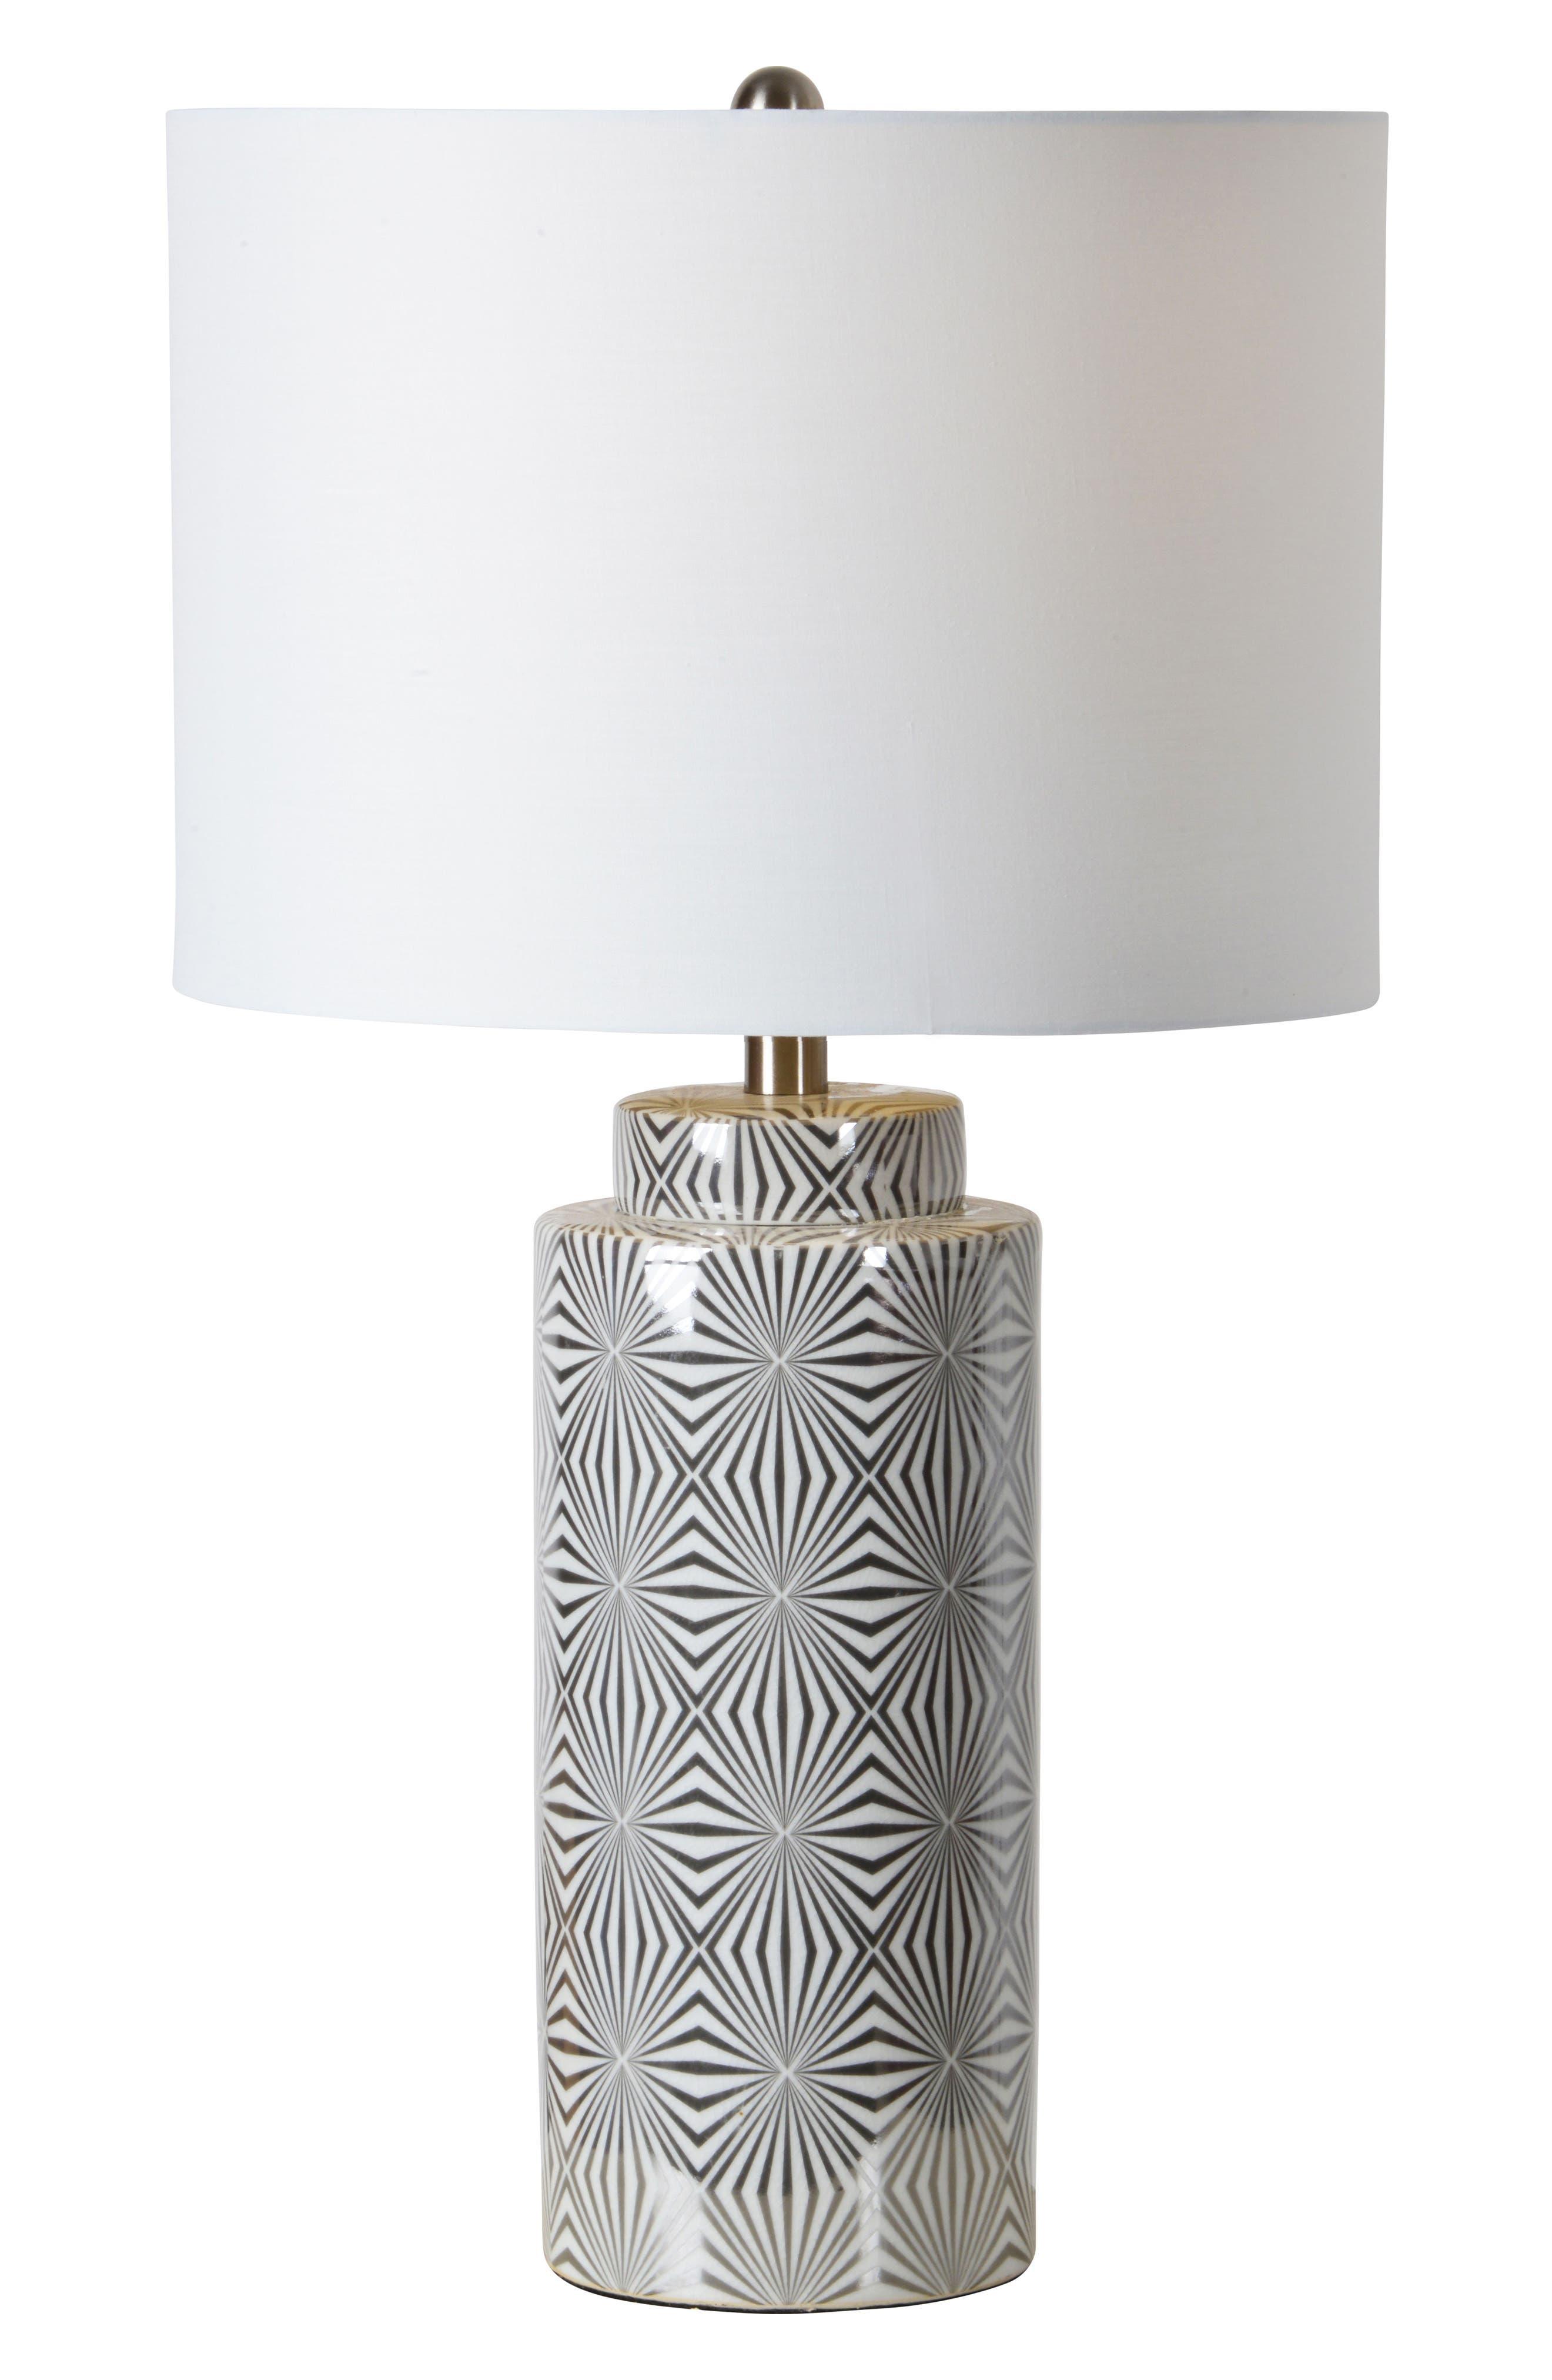 Camden Table Lamp,                         Main,                         color, Silver/ White